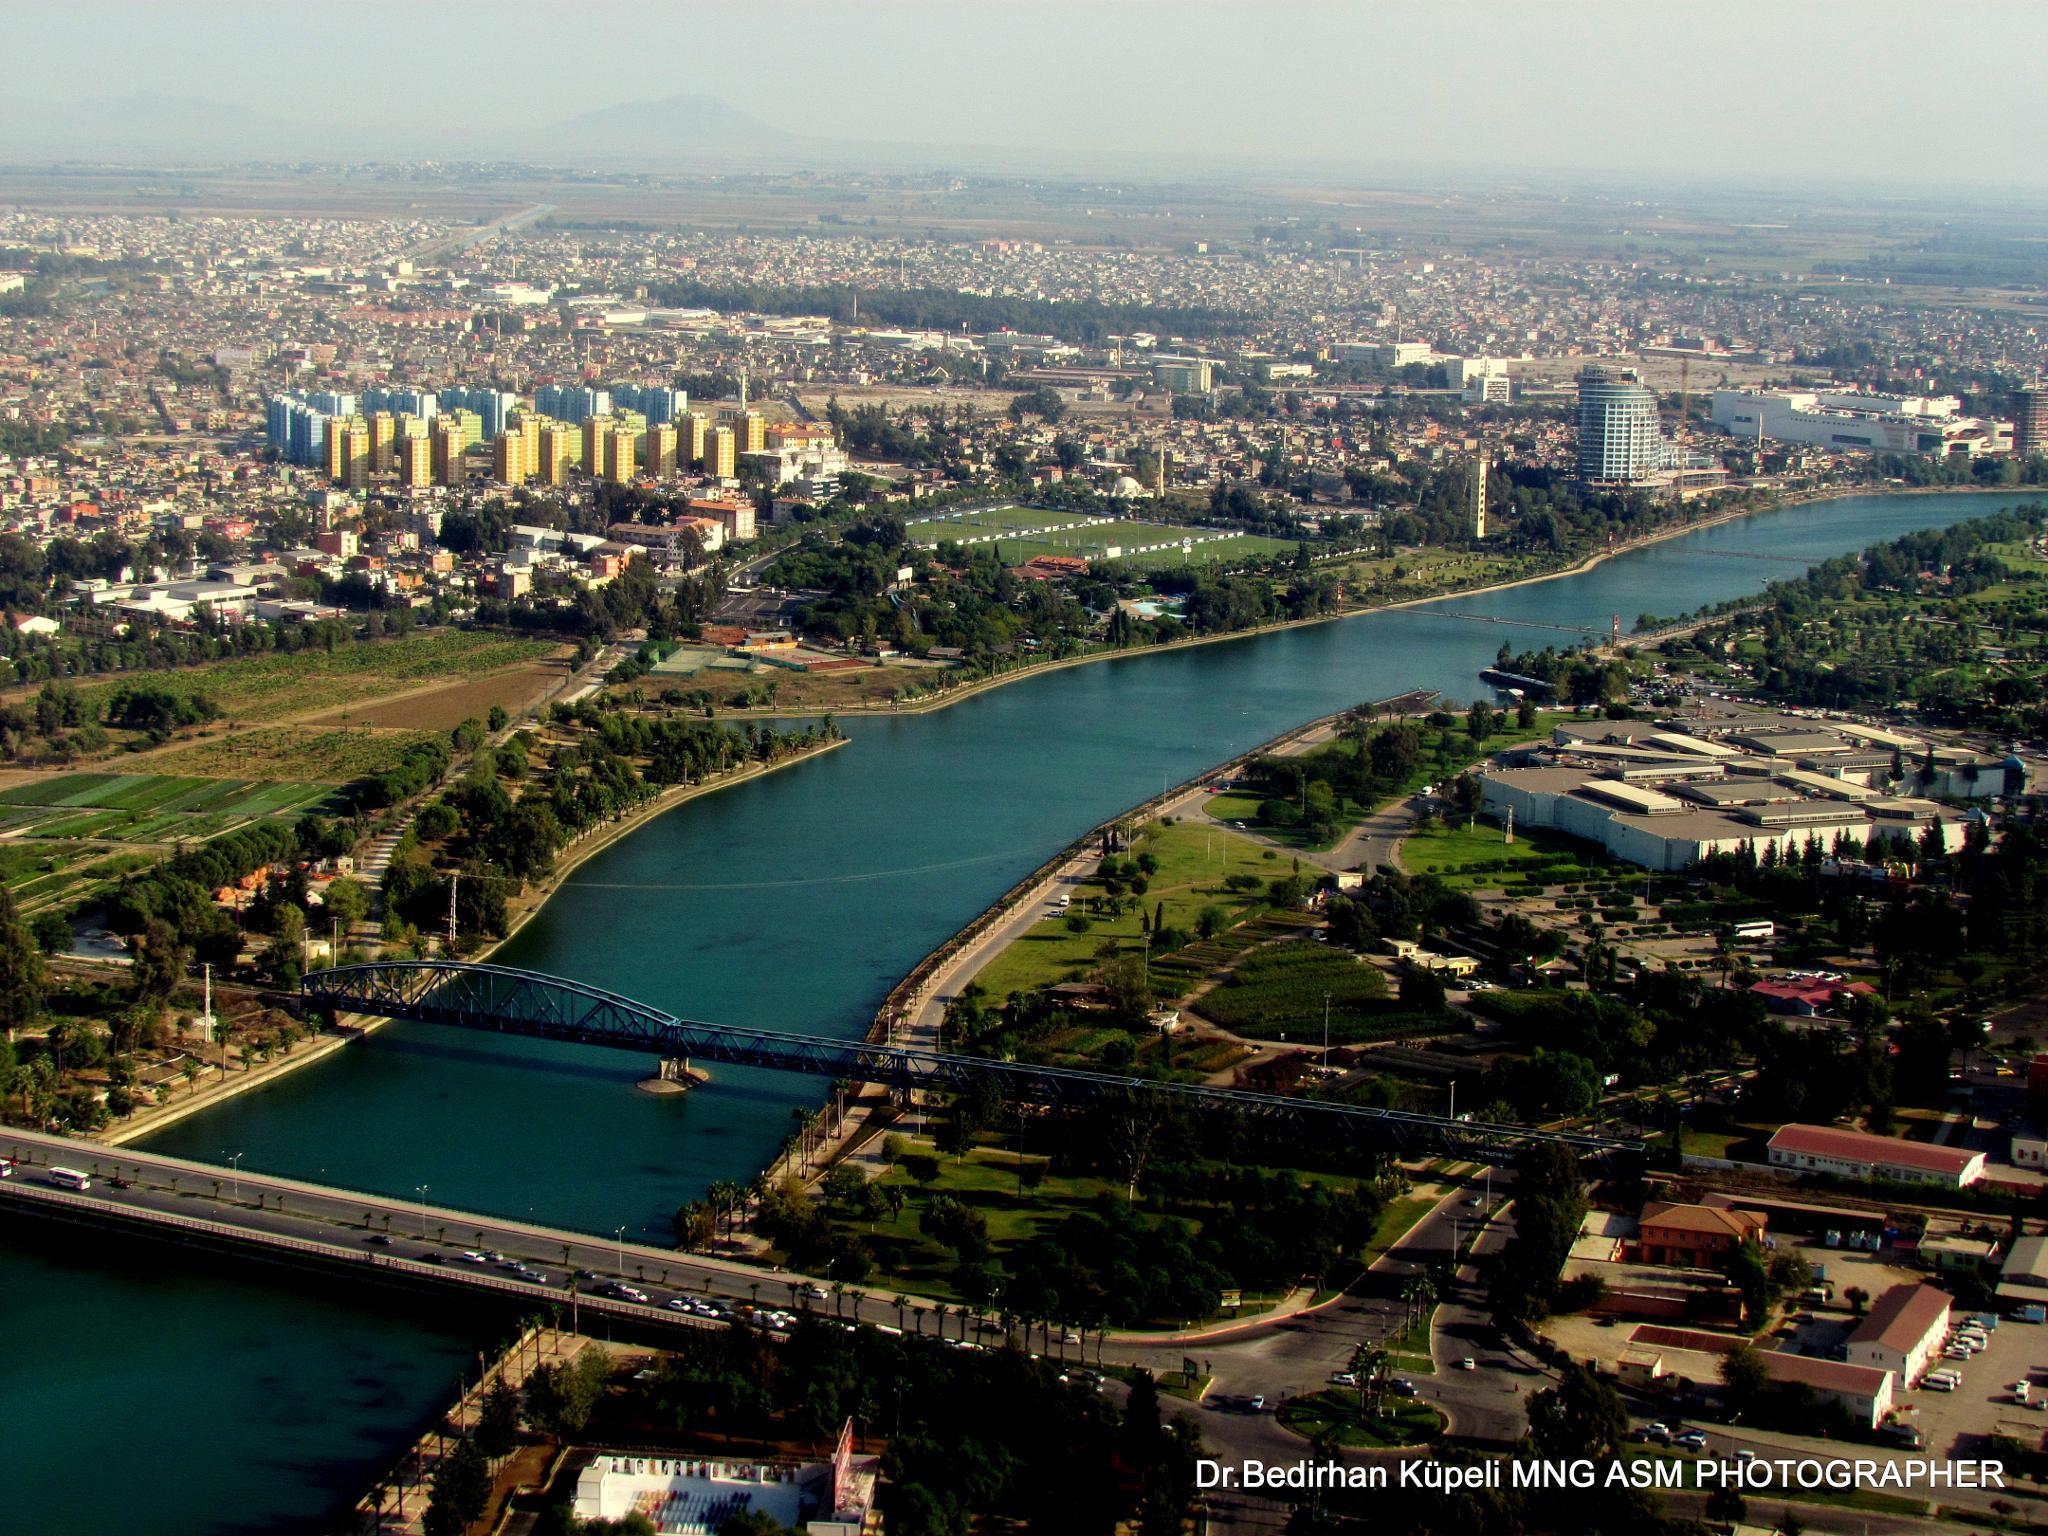 The view from Adana by Bedirhan Küpeli